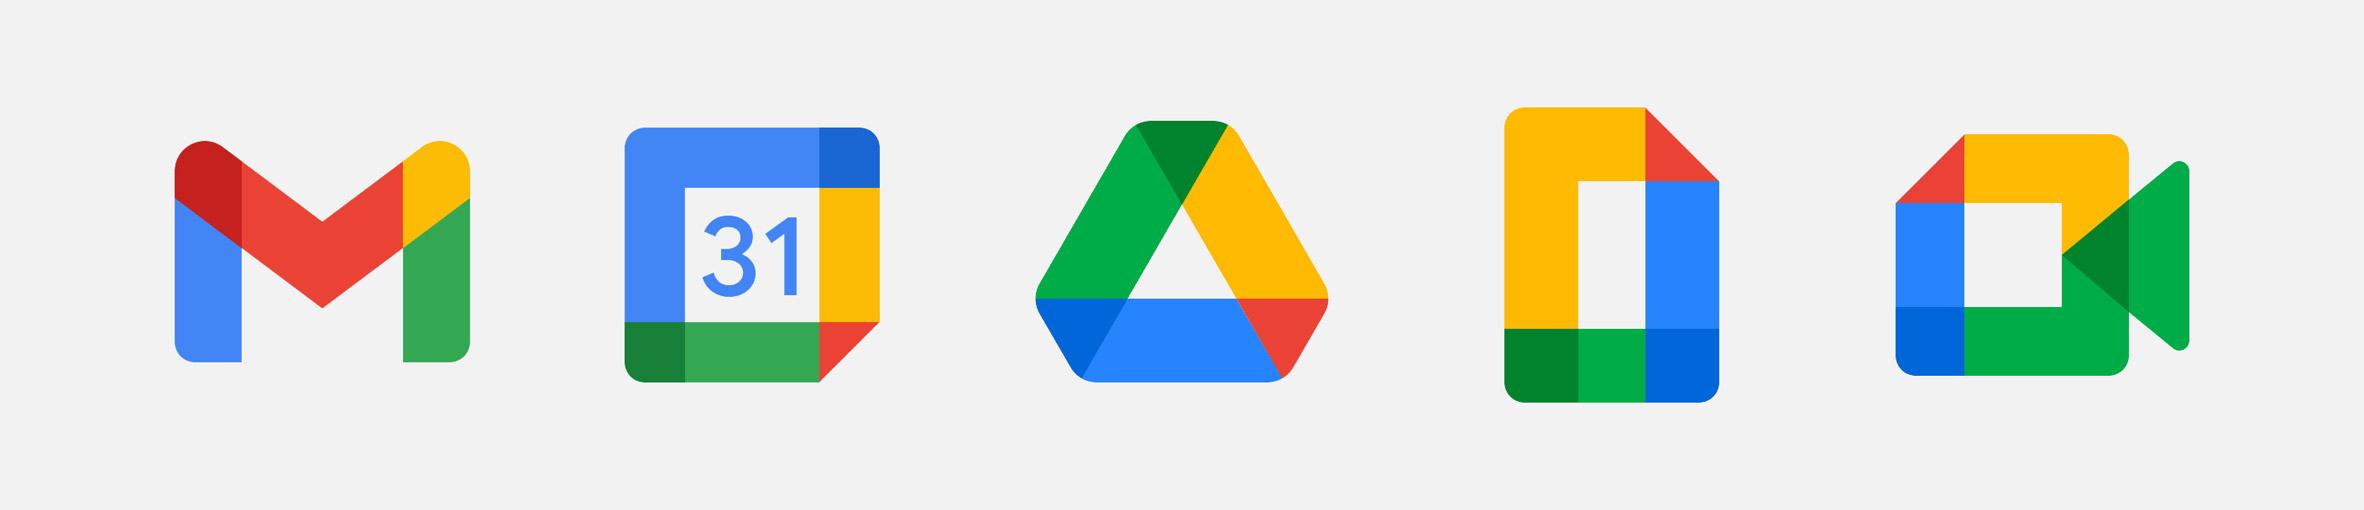 Google rebrands G Suite as Google Workspace